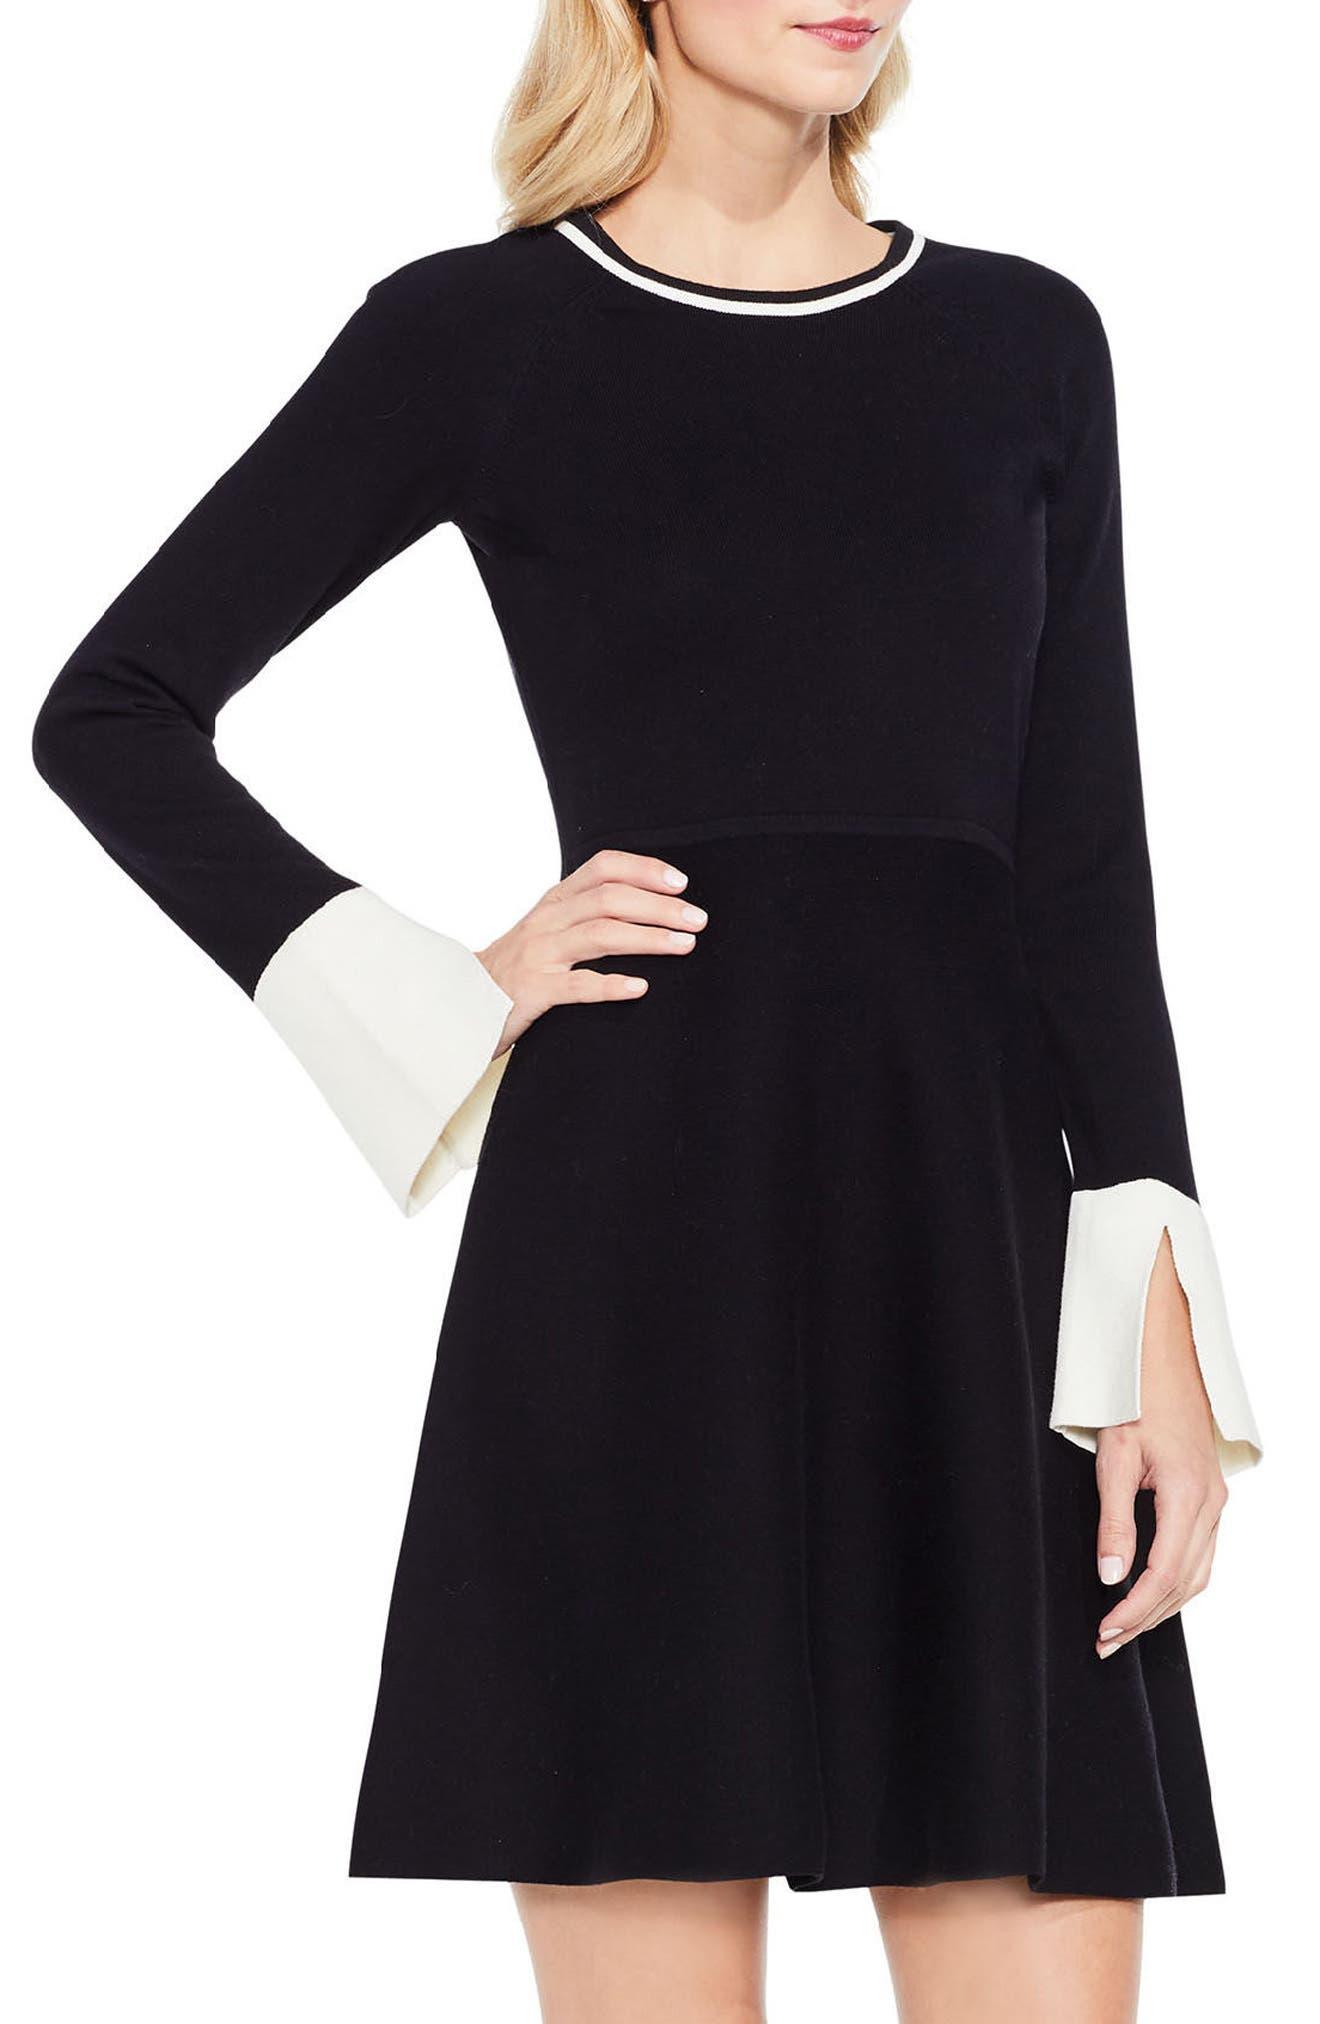 Alternate Image 1 Selected - Vince Camuto Fit & Flare Sweater Dress (Regular & Petite)